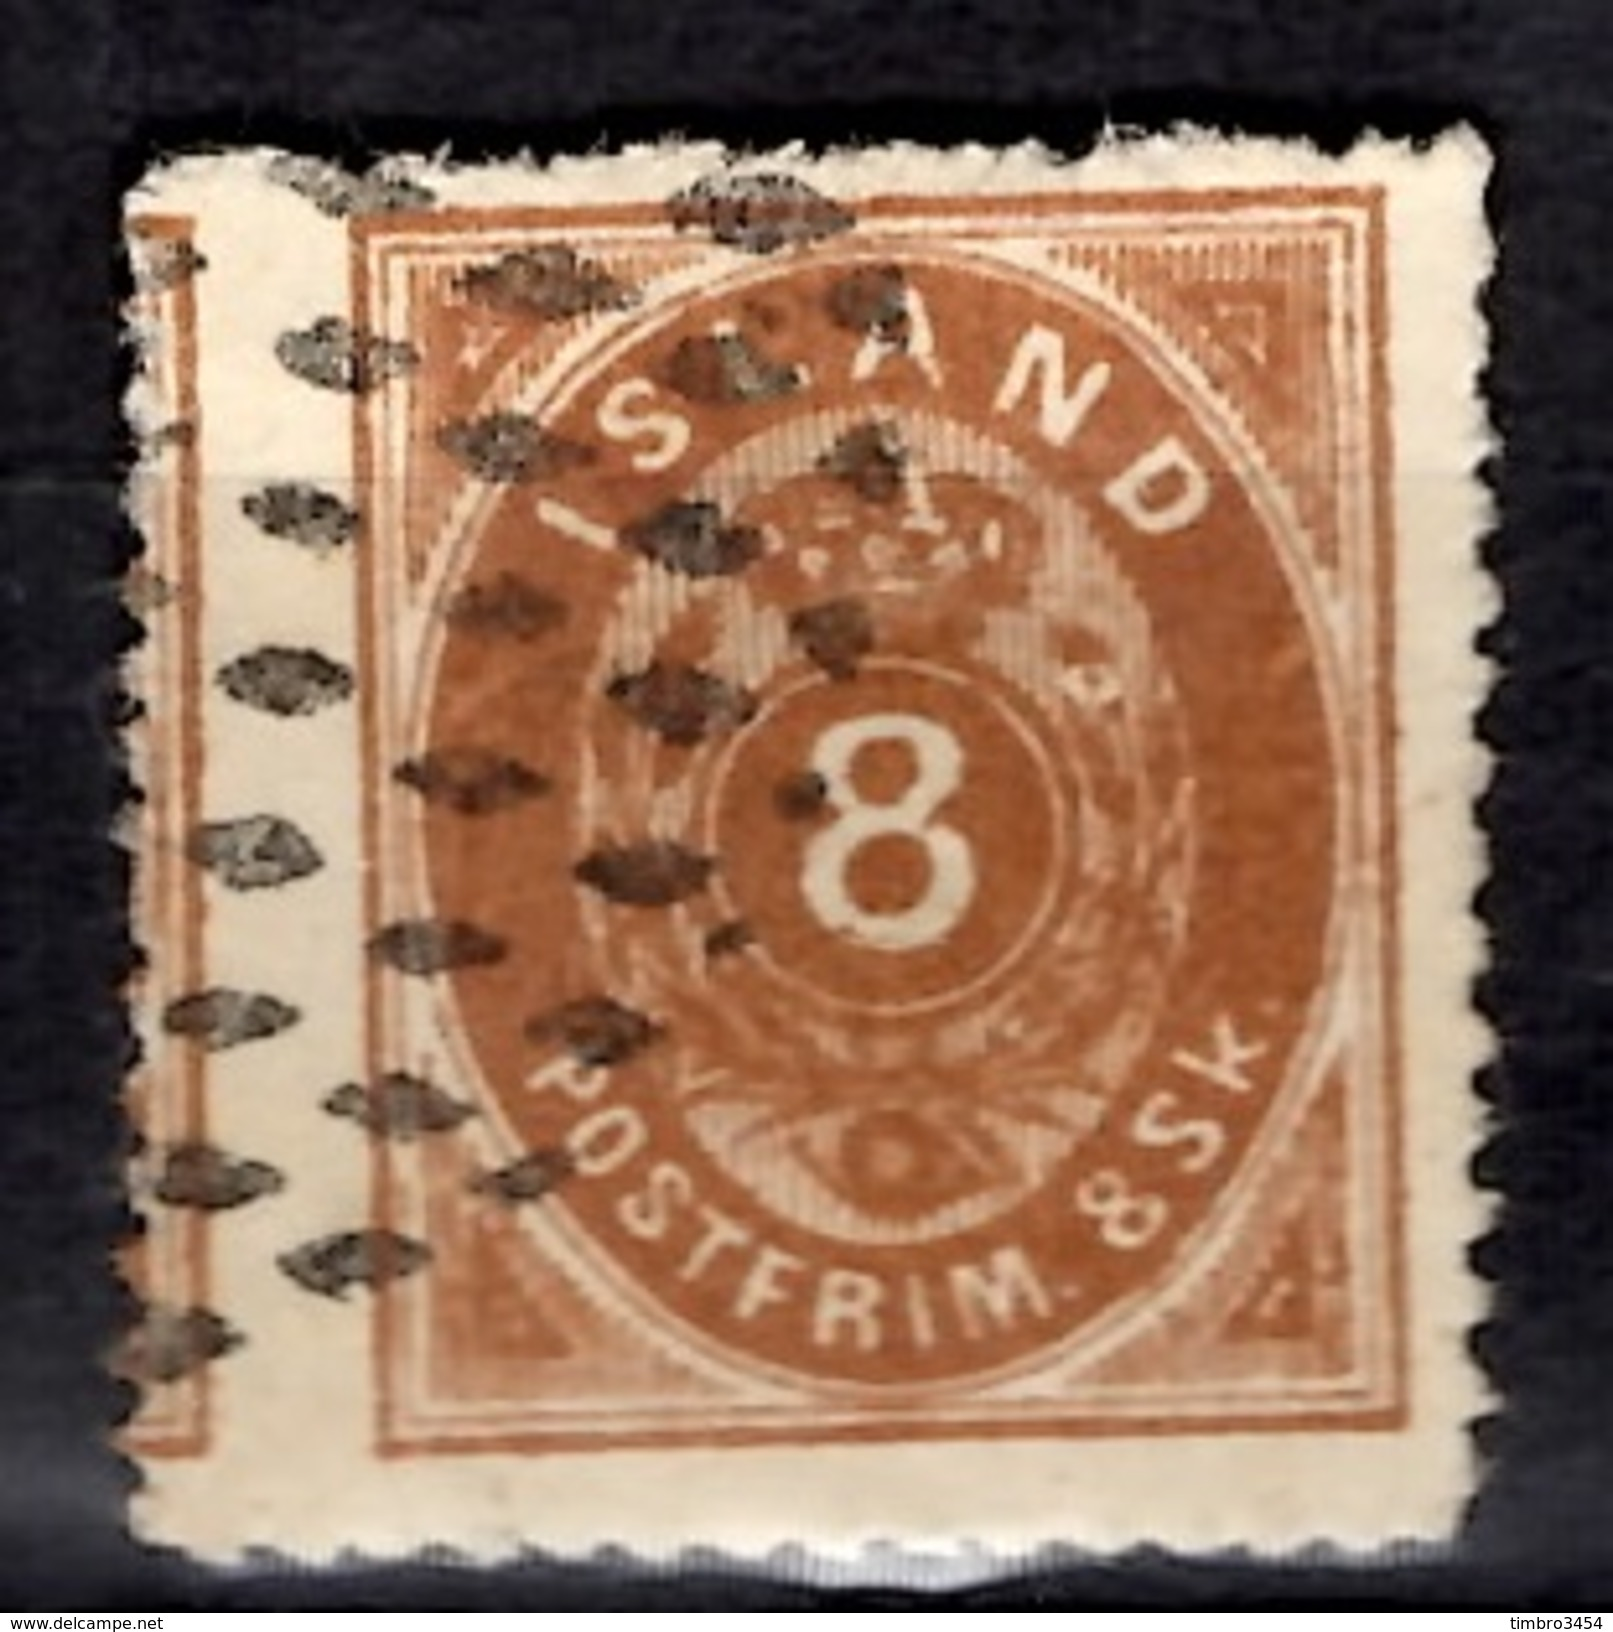 Islande YT N° 4 Oblitéré. Rare! B/TB. A Saisir! - 1873-1918 Danish Dependence